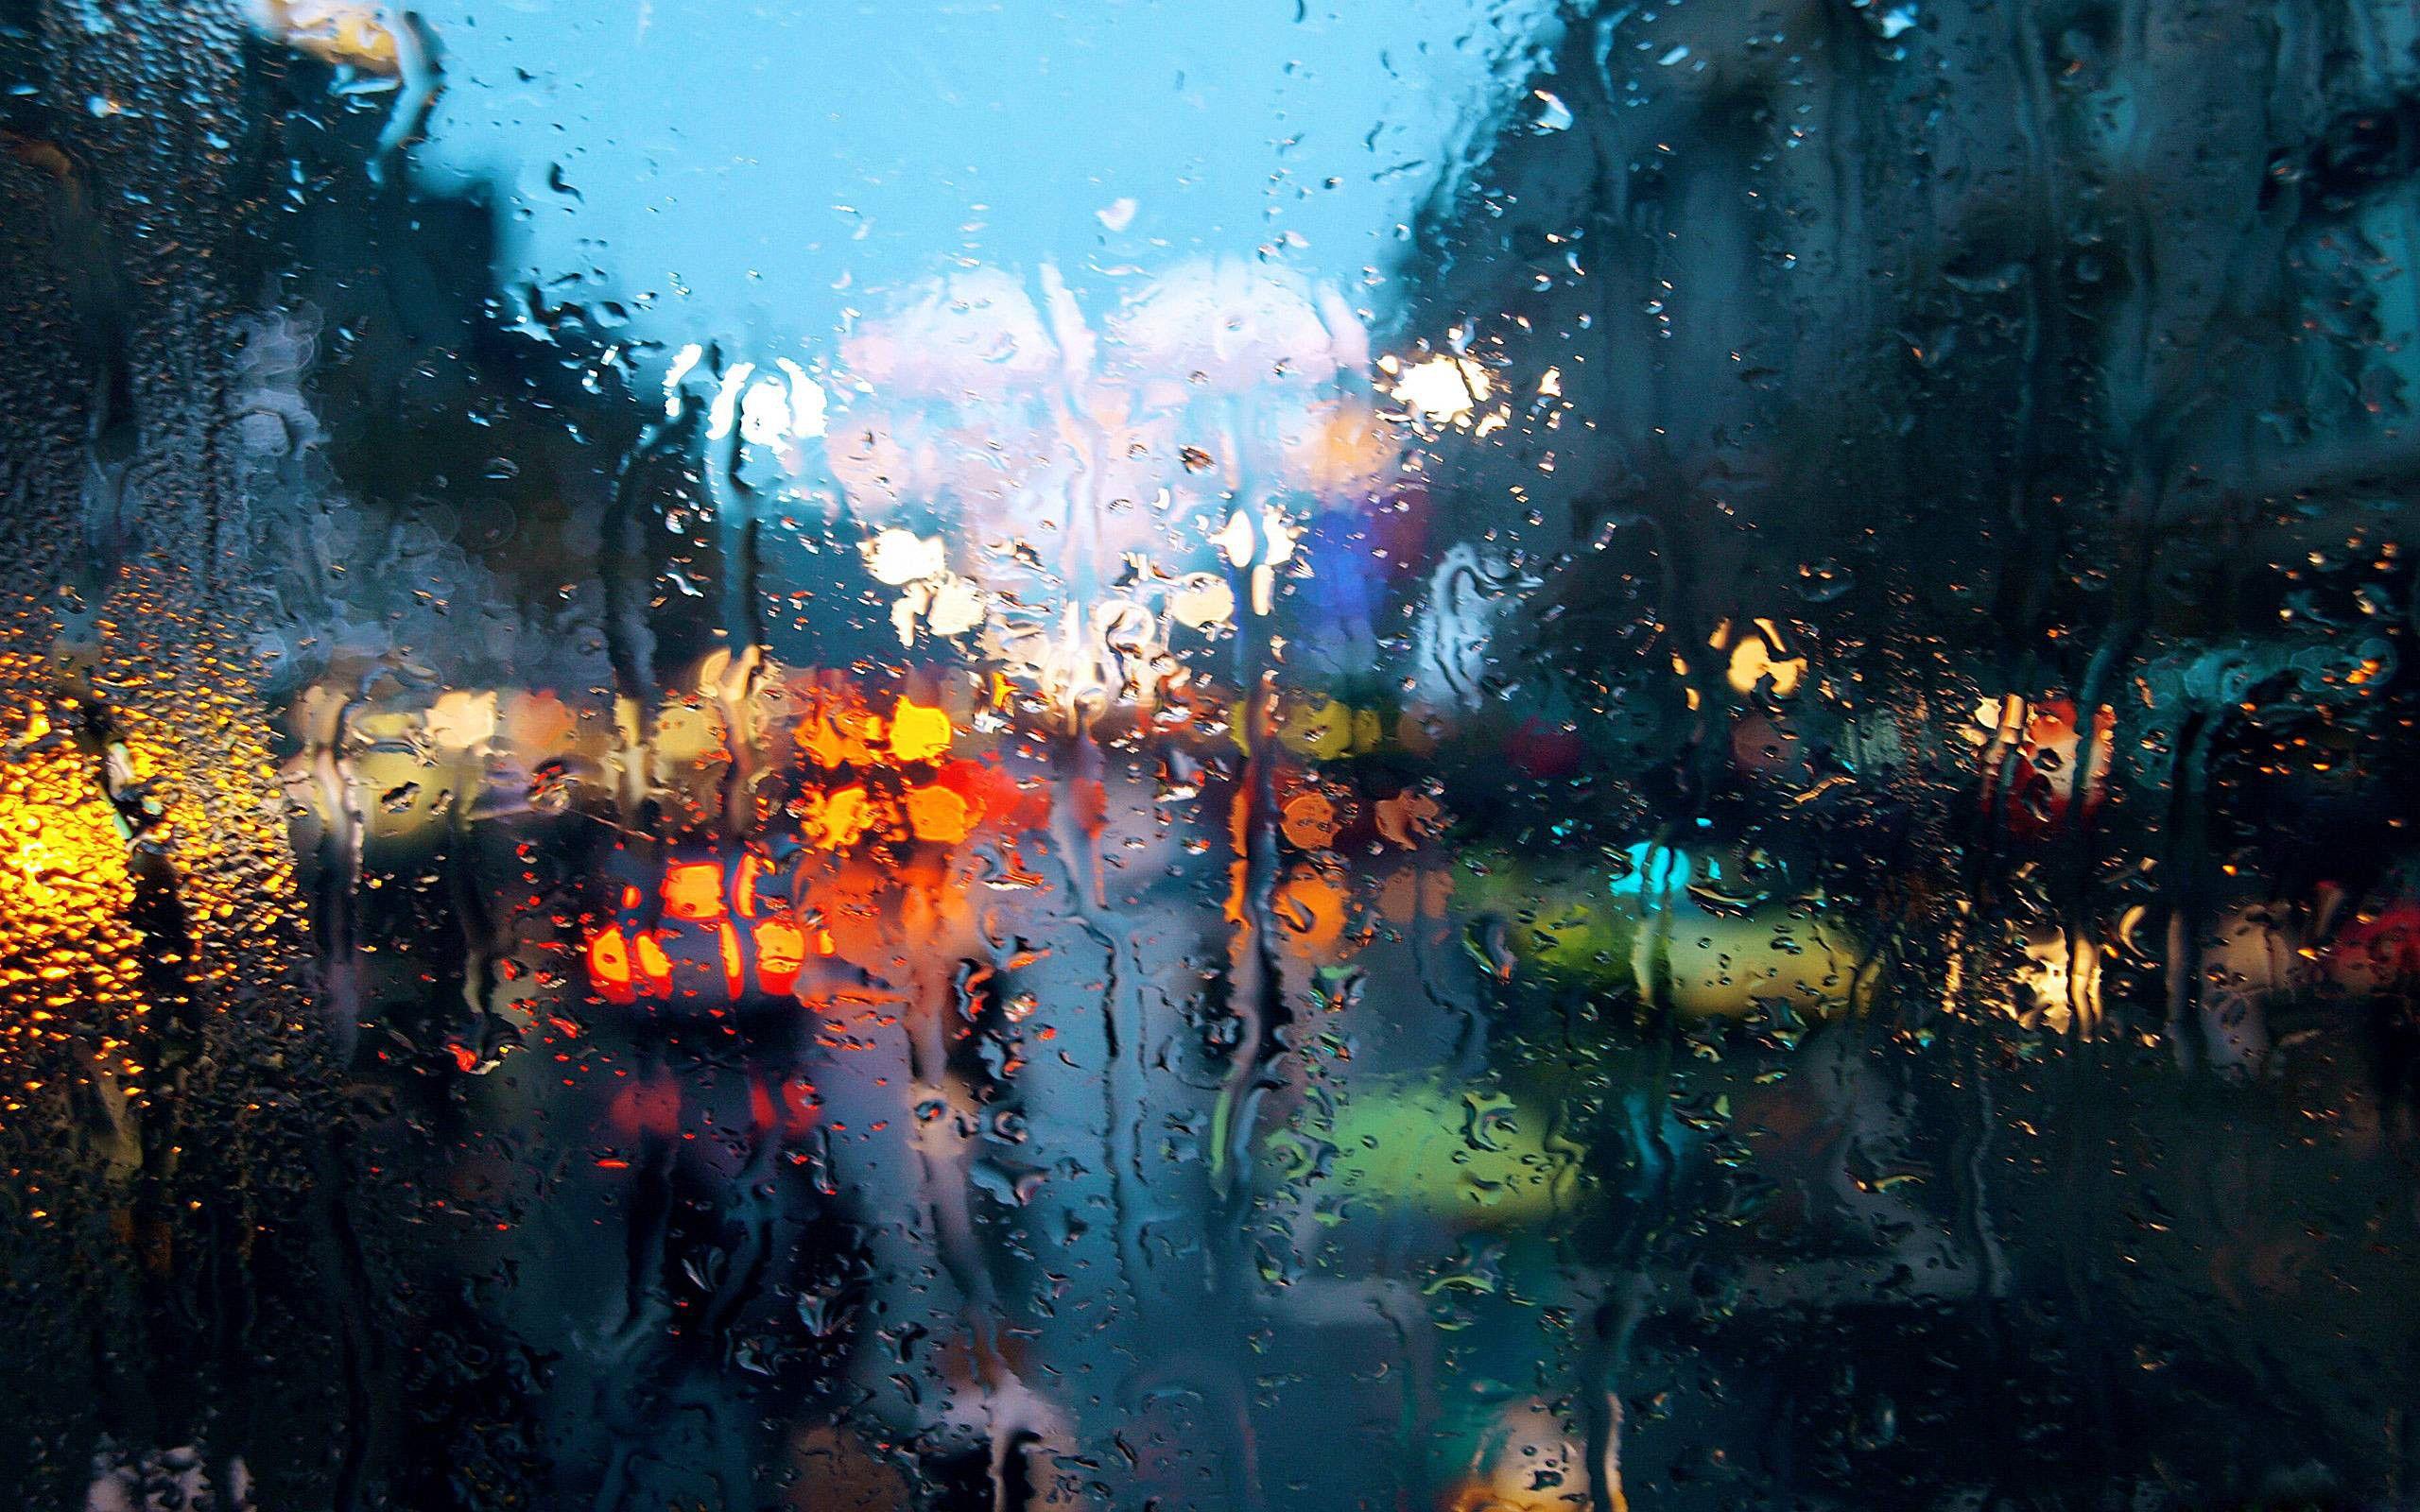 4k Rain Wallpaper 47 Images Digital Painting Rain Wallpapers Rainy Window